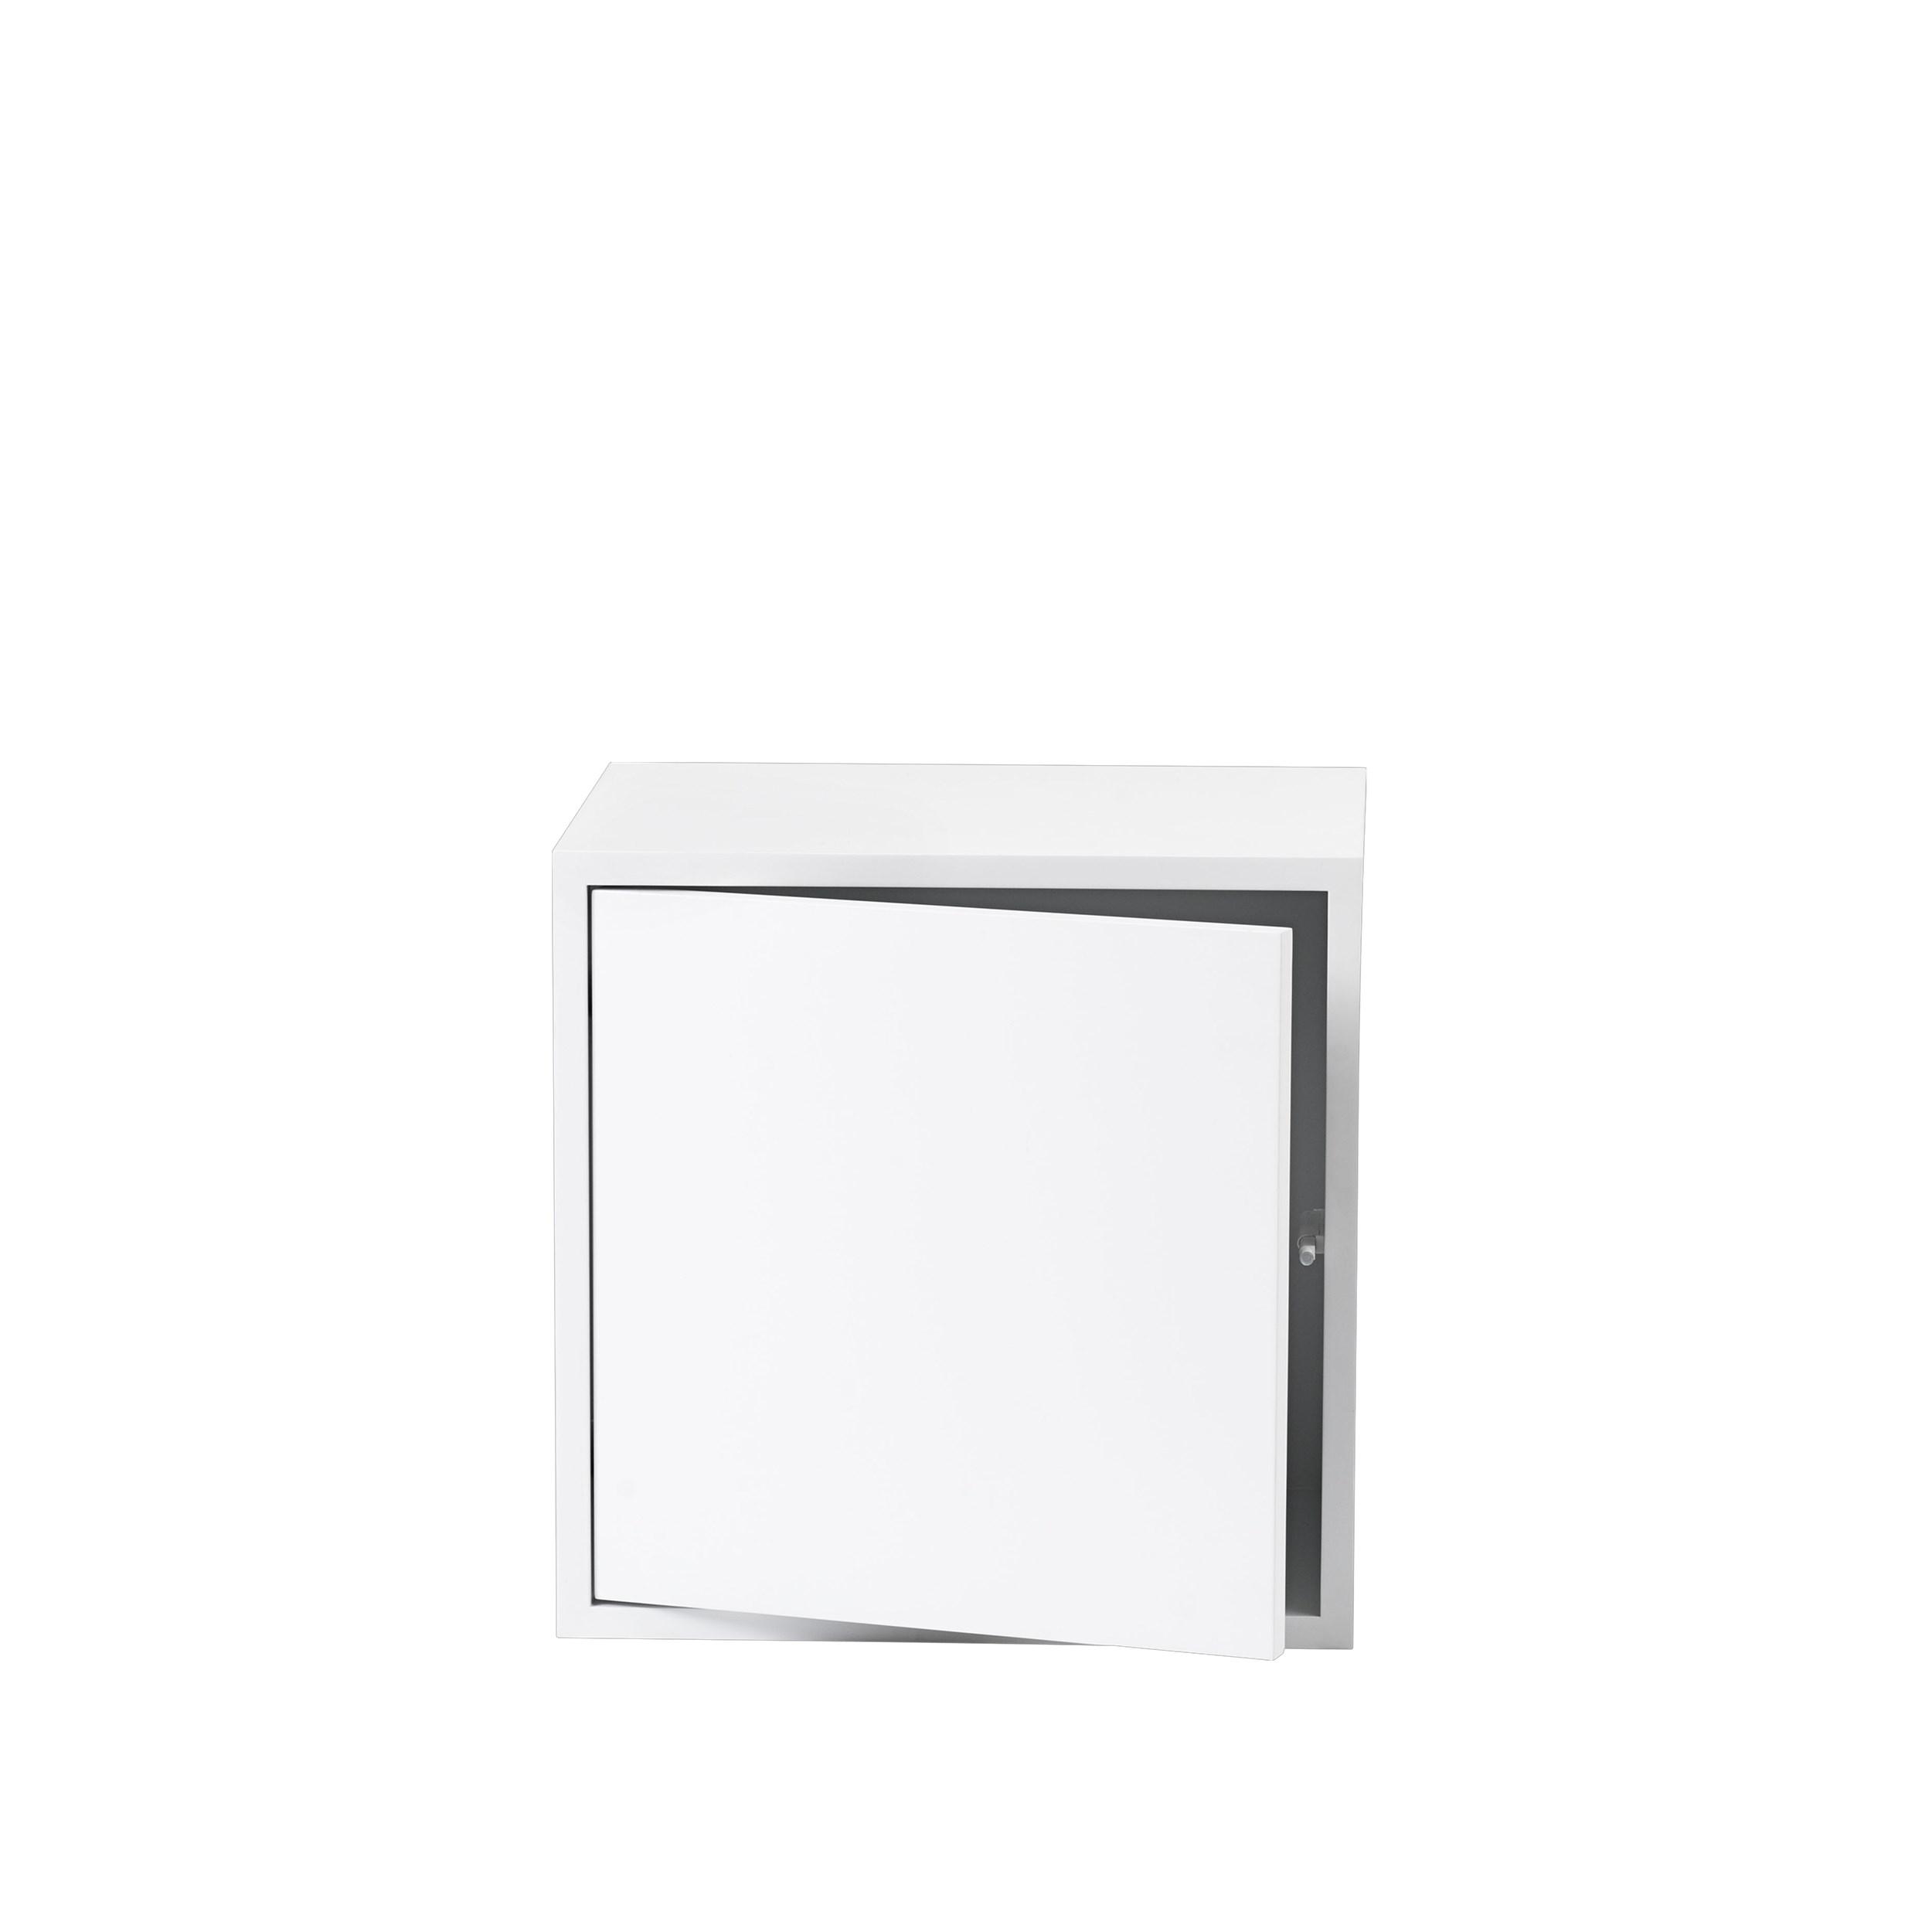 Stacked 2.0 medium with door white